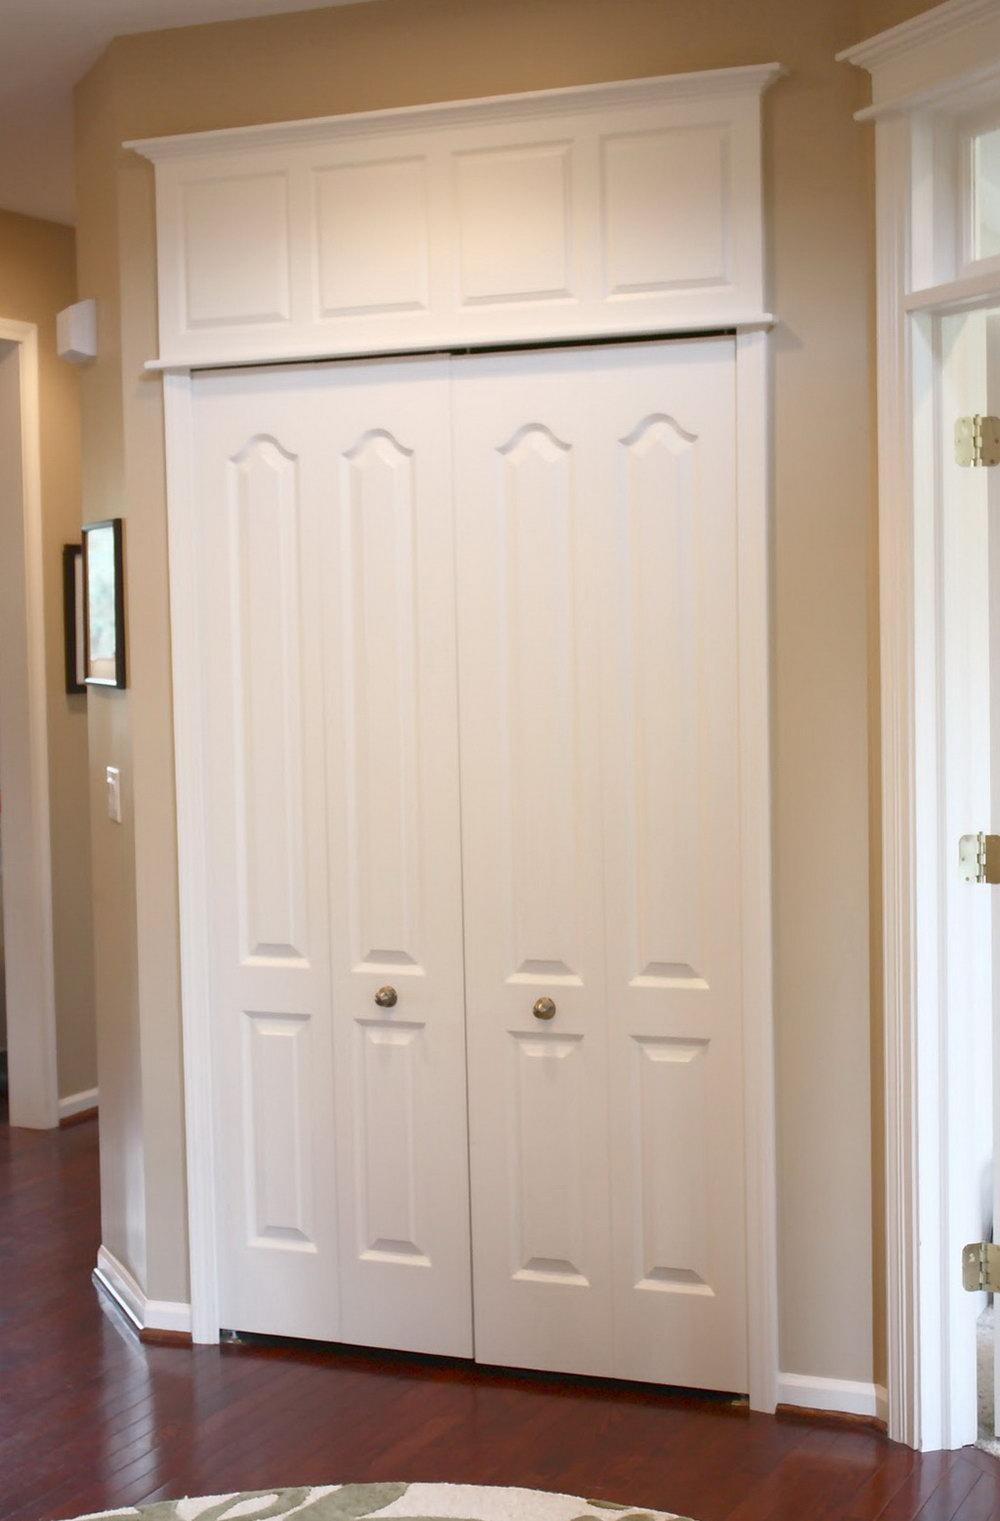 How To Make A Closet Door Secure